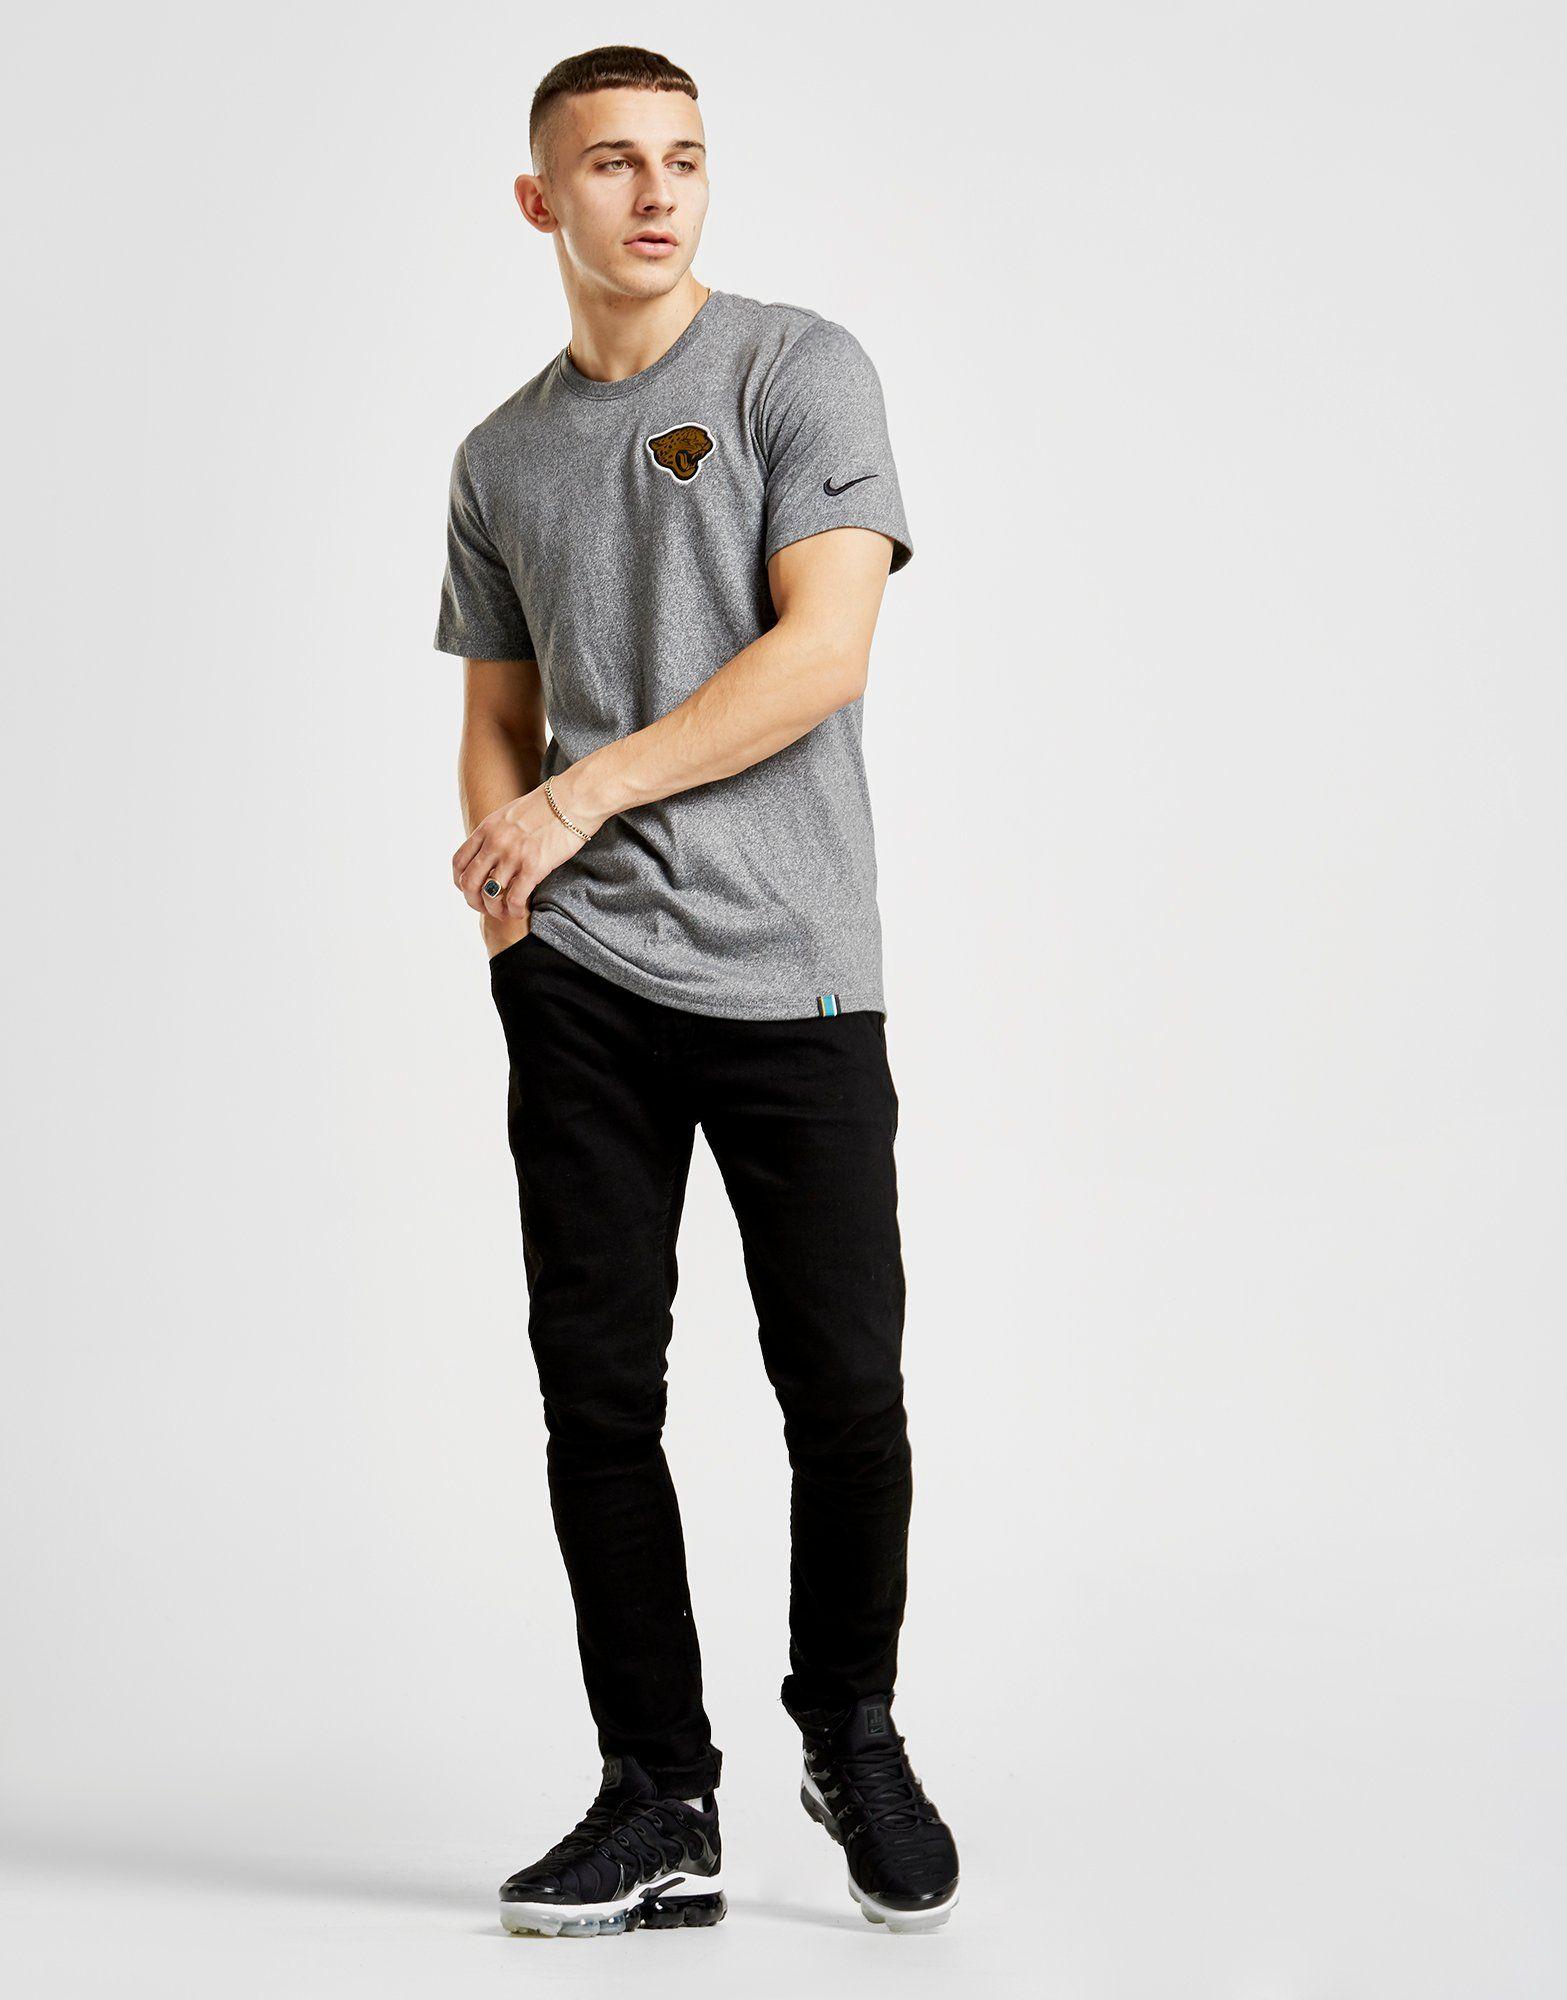 Nike NFL Jacksonville Jaguars T-Shirt Grau